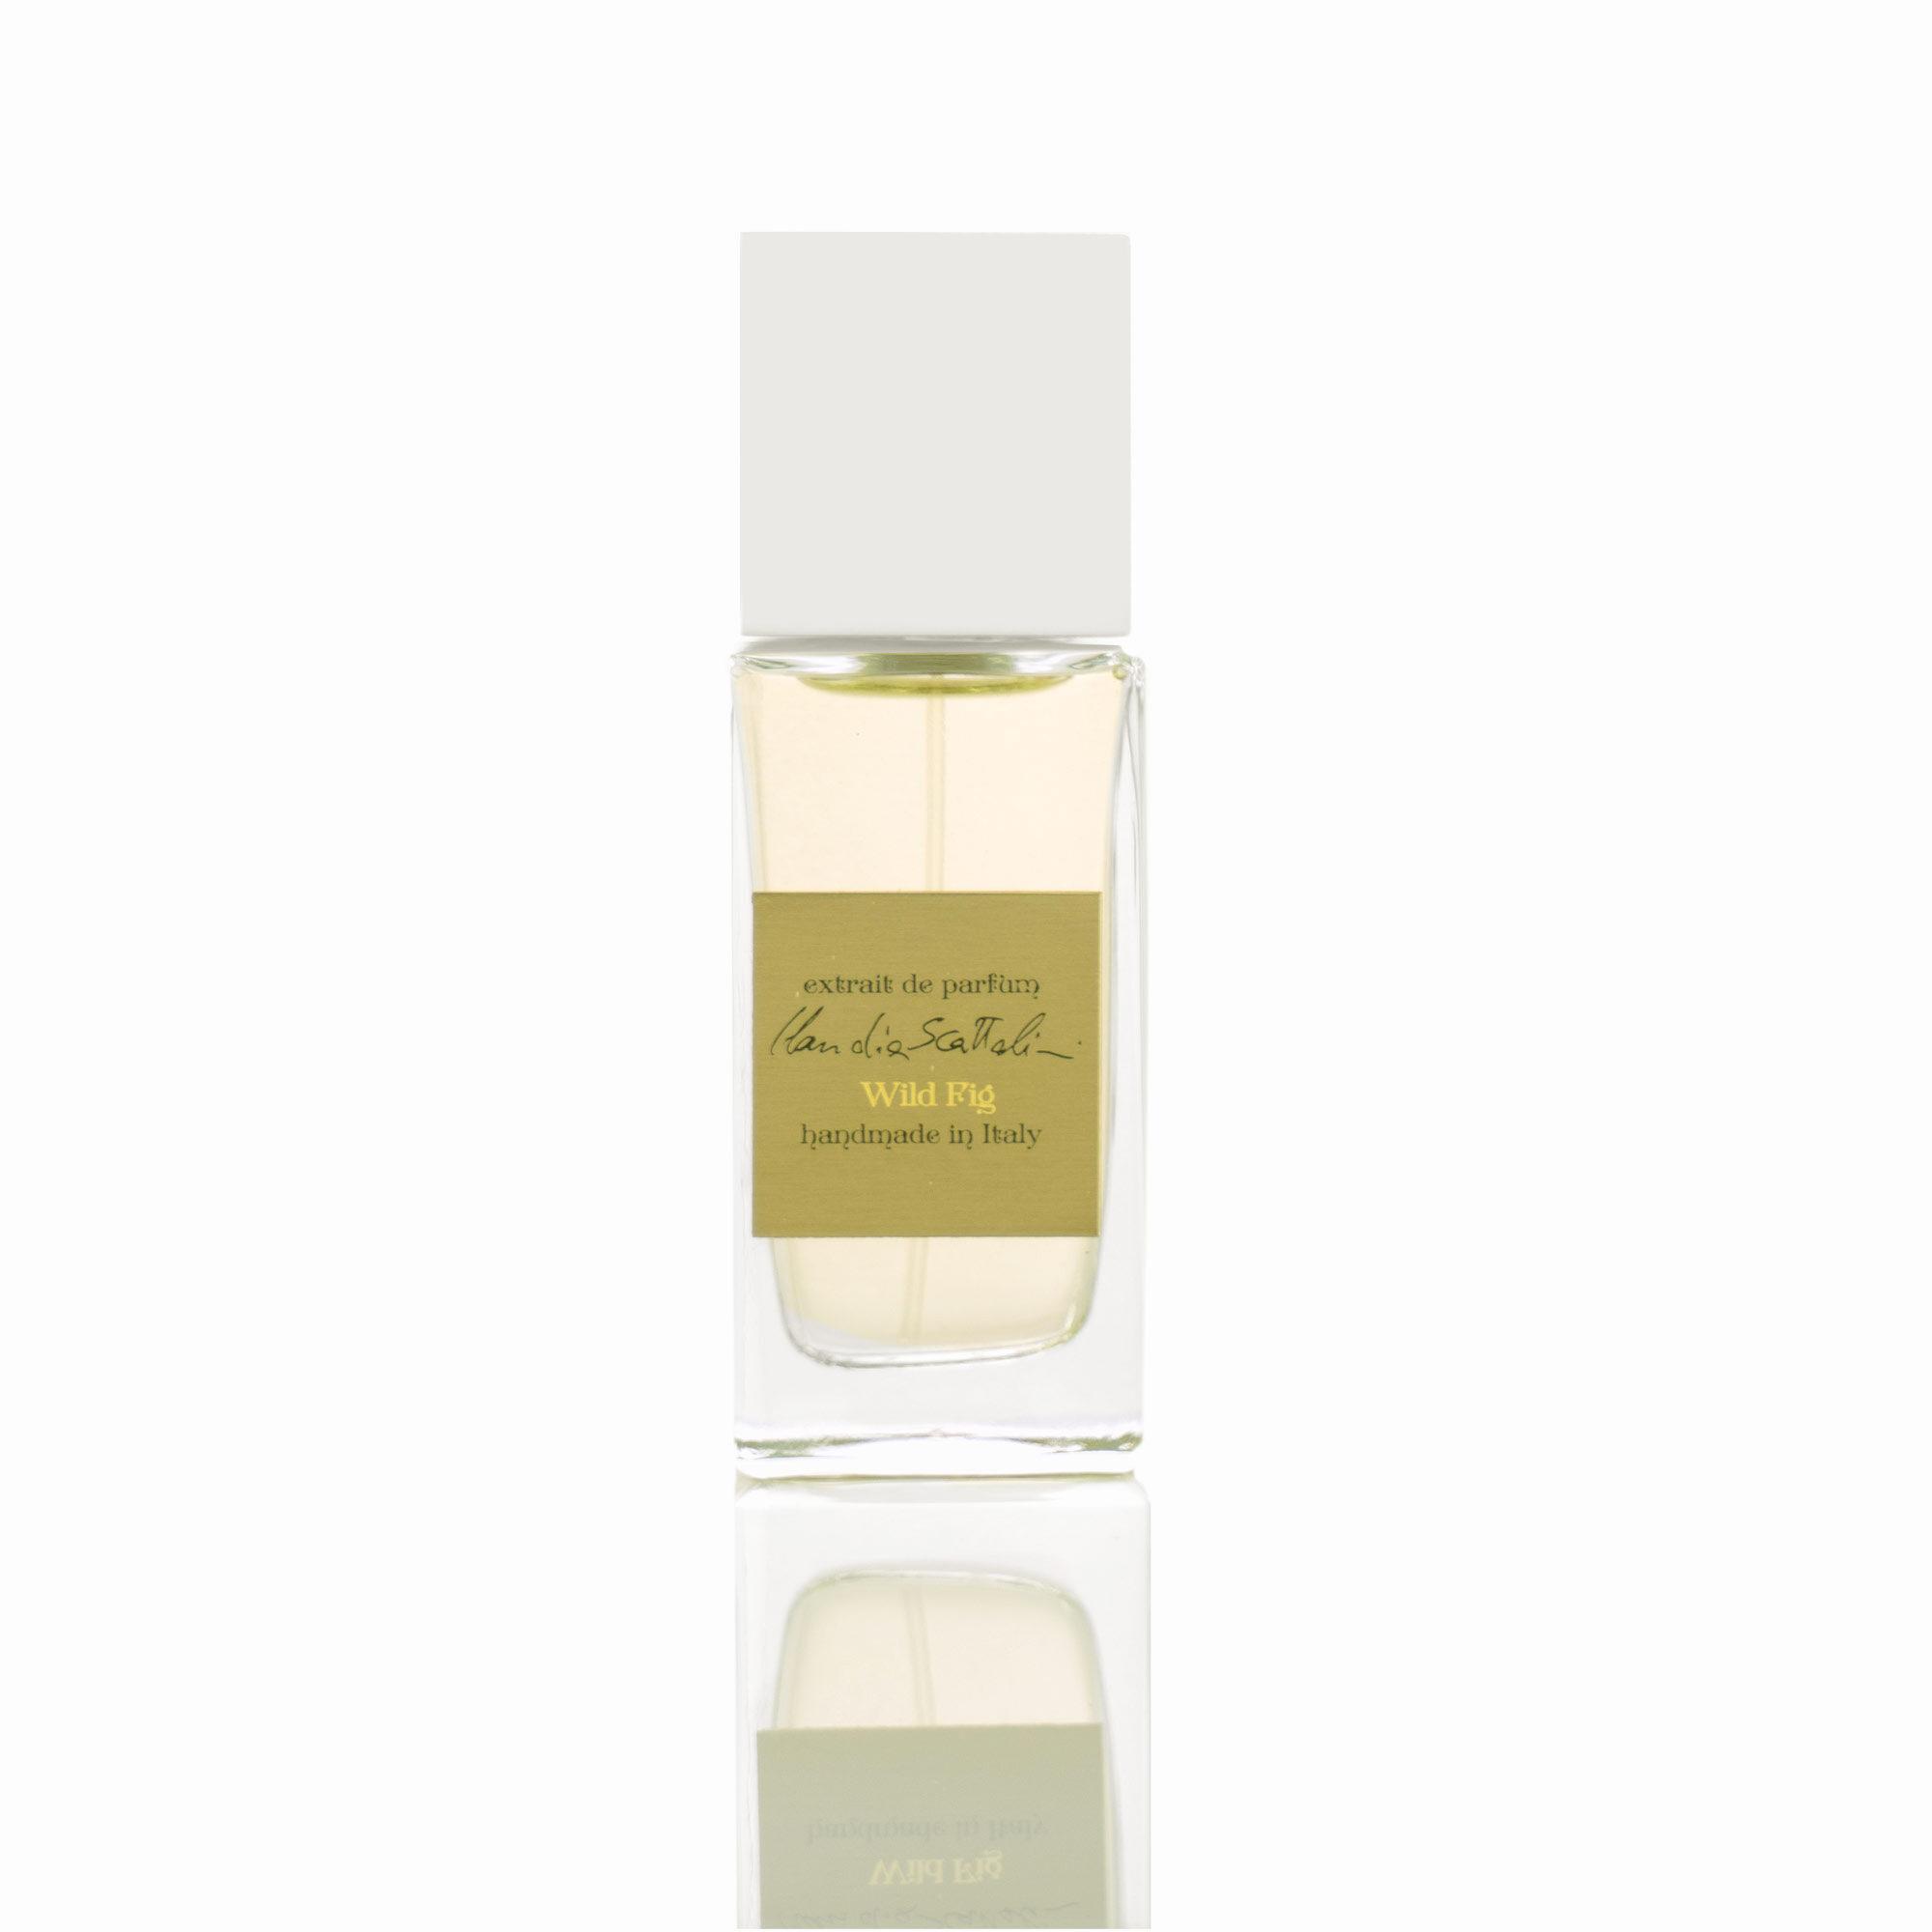 Wlld Fig Extrait de Parfum